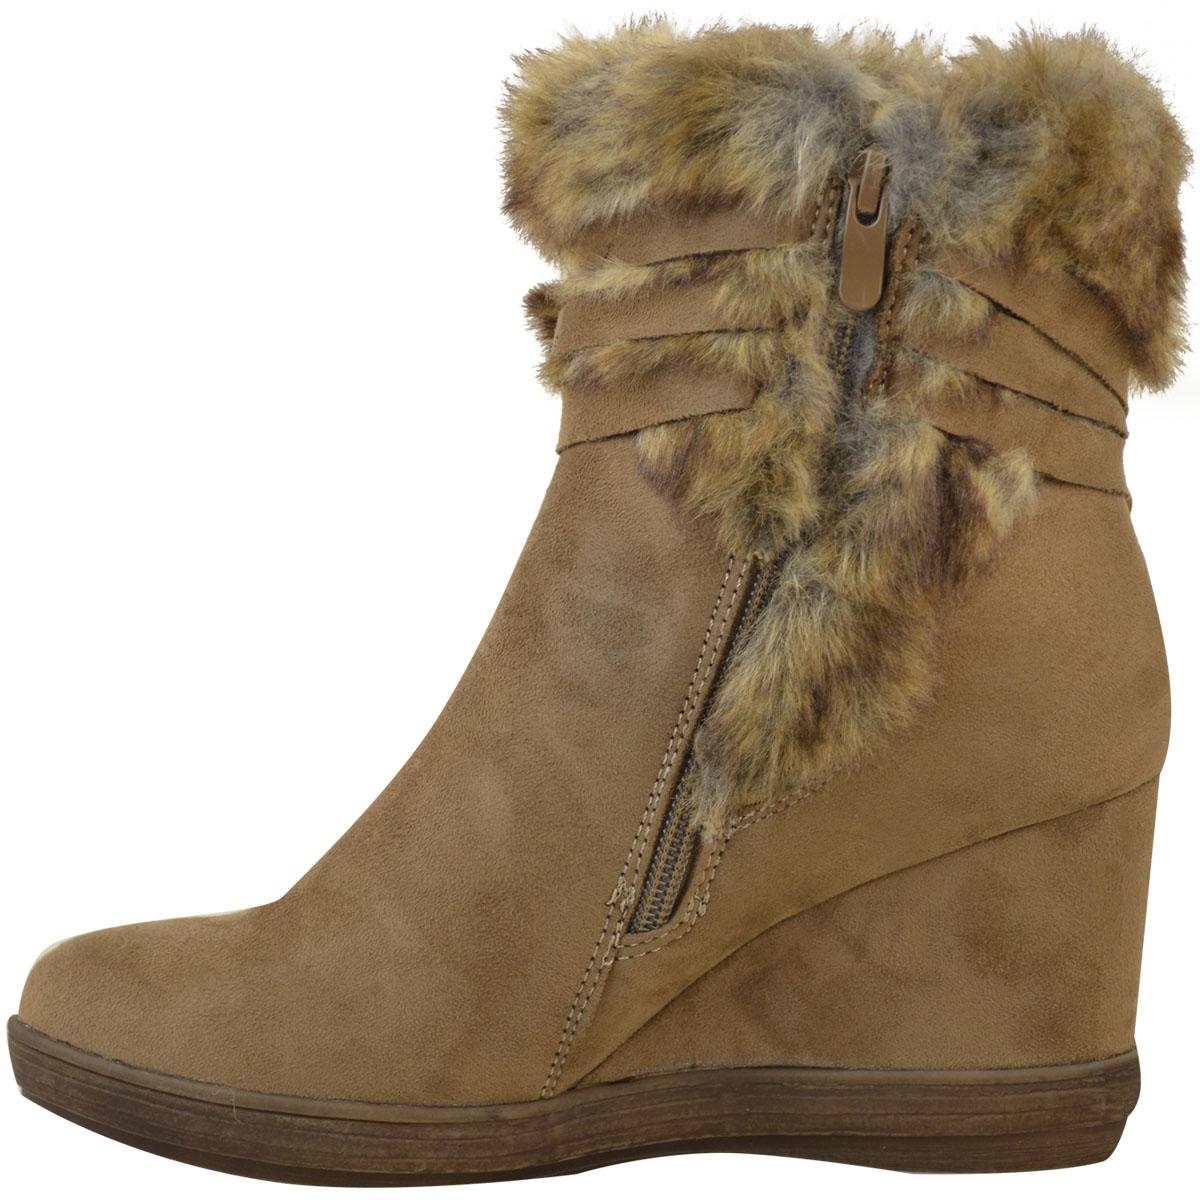 Womens-Ladies-Wedge-Low-Heel-Winter-Knee-Boots-Warm-Faux-Fur-Fleece-Size-UK thumbnail 26